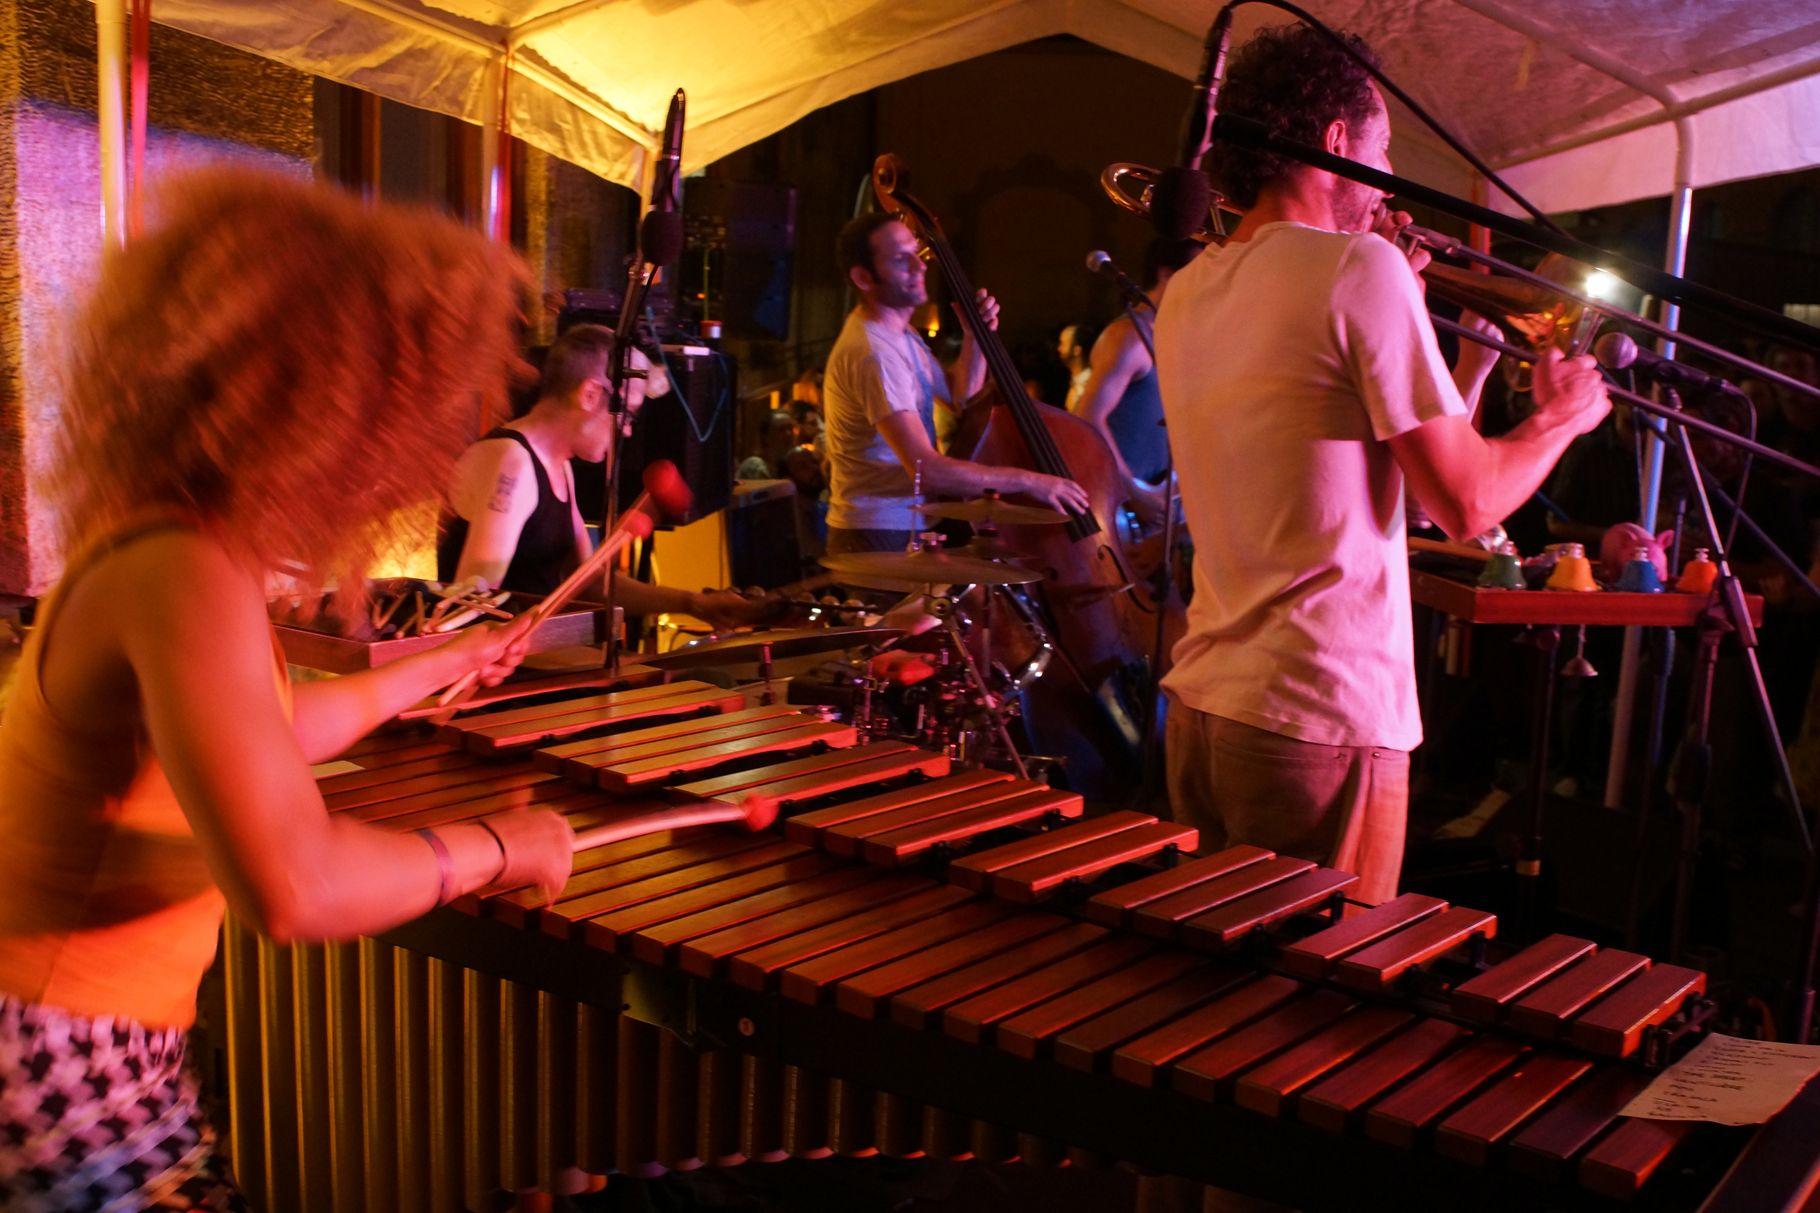 Konzerte im Bürgerhof 04.07.2013 Orchestre Tout Puissant Marcel Duchamp - Freiwilligen-Zentrum Augsburg - Foto: Crayfish